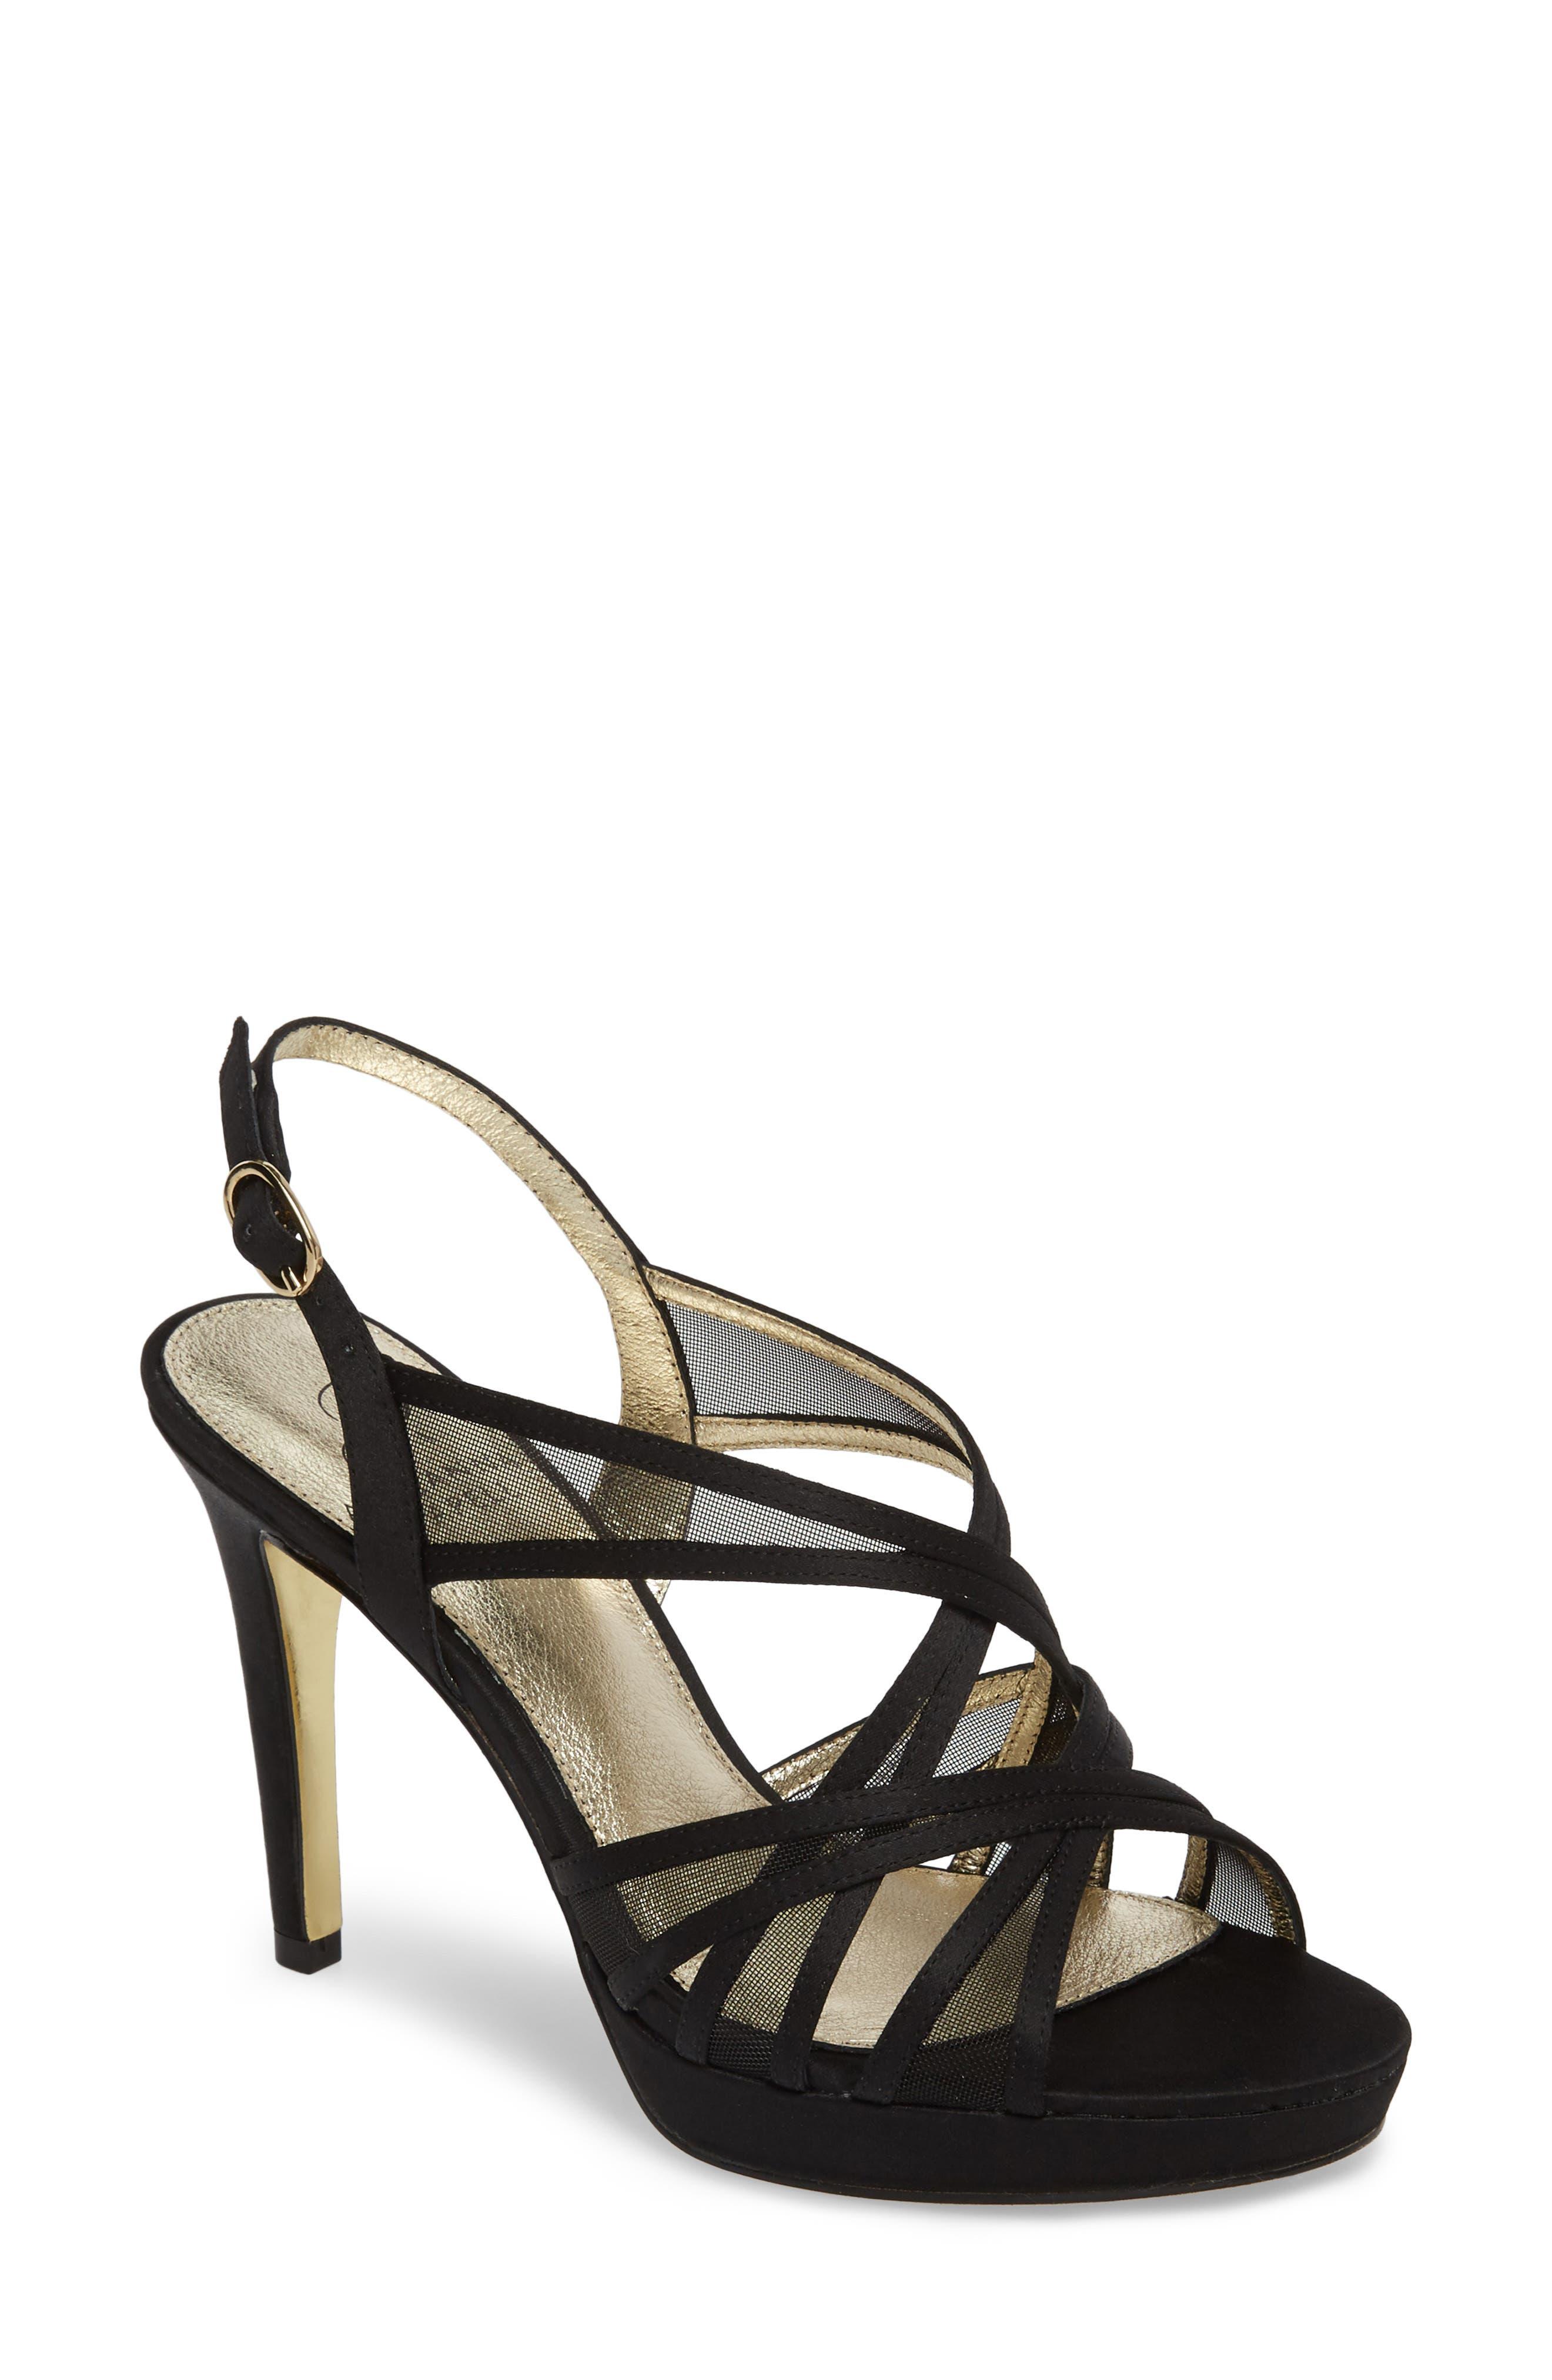 Adri Platform Sandal,                         Main,                         color, BLACK SATIN